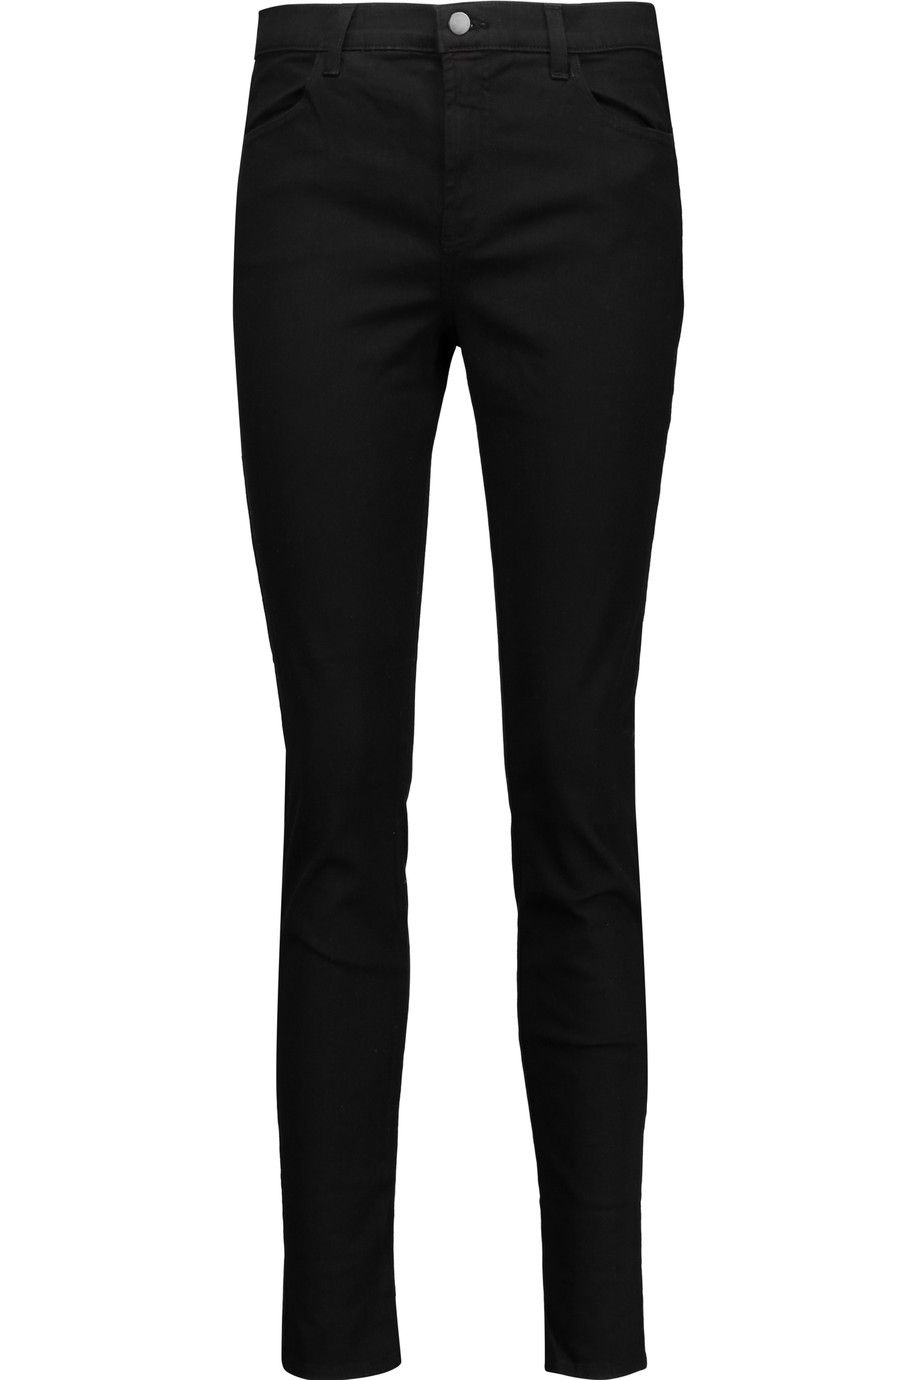 J BRAND Maria High-Rise Skinny Jeans. #jbrand #cloth #jeans